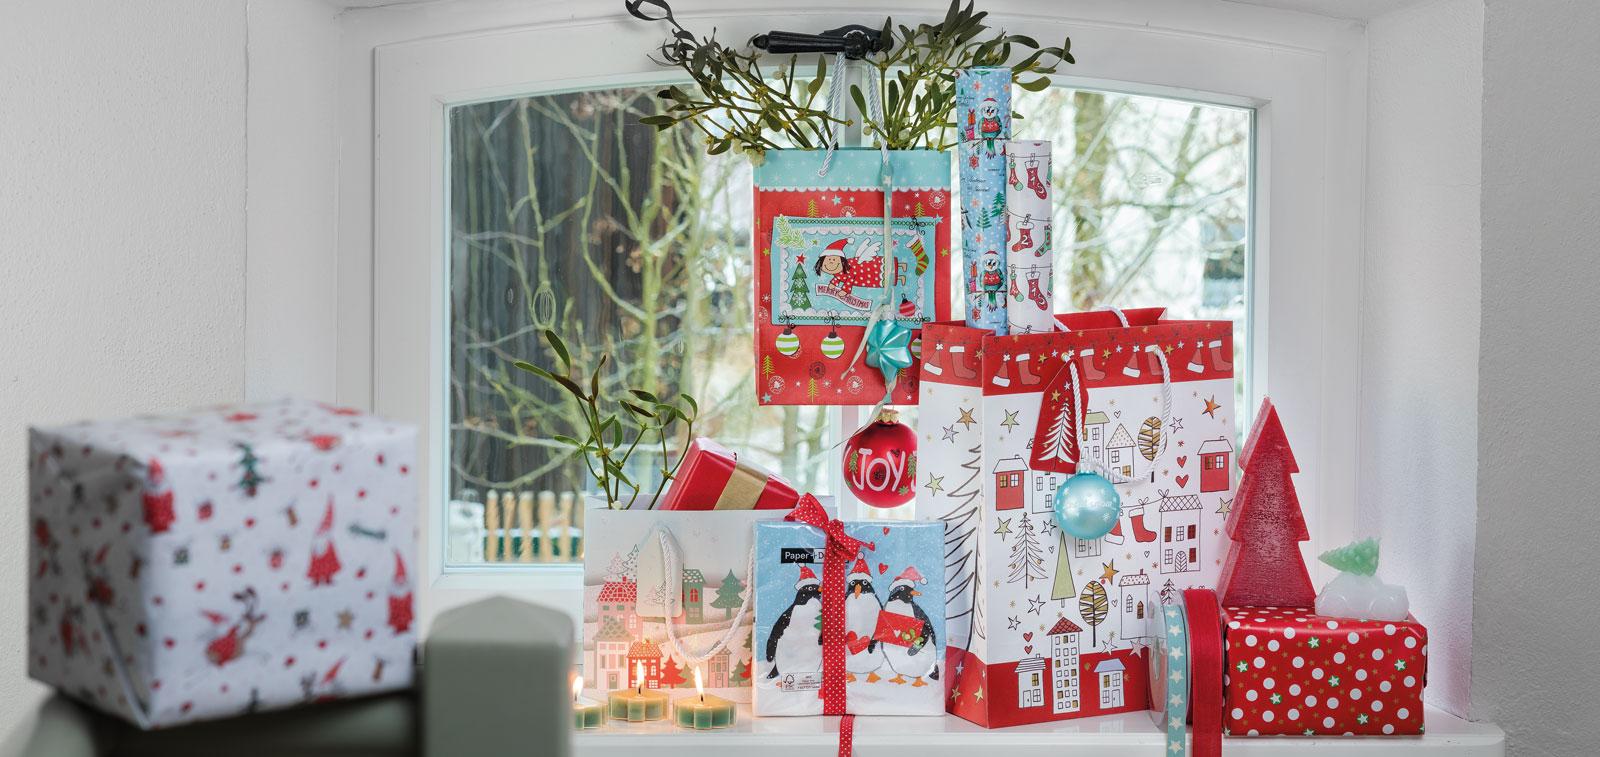 Merry Everything Deko Stil